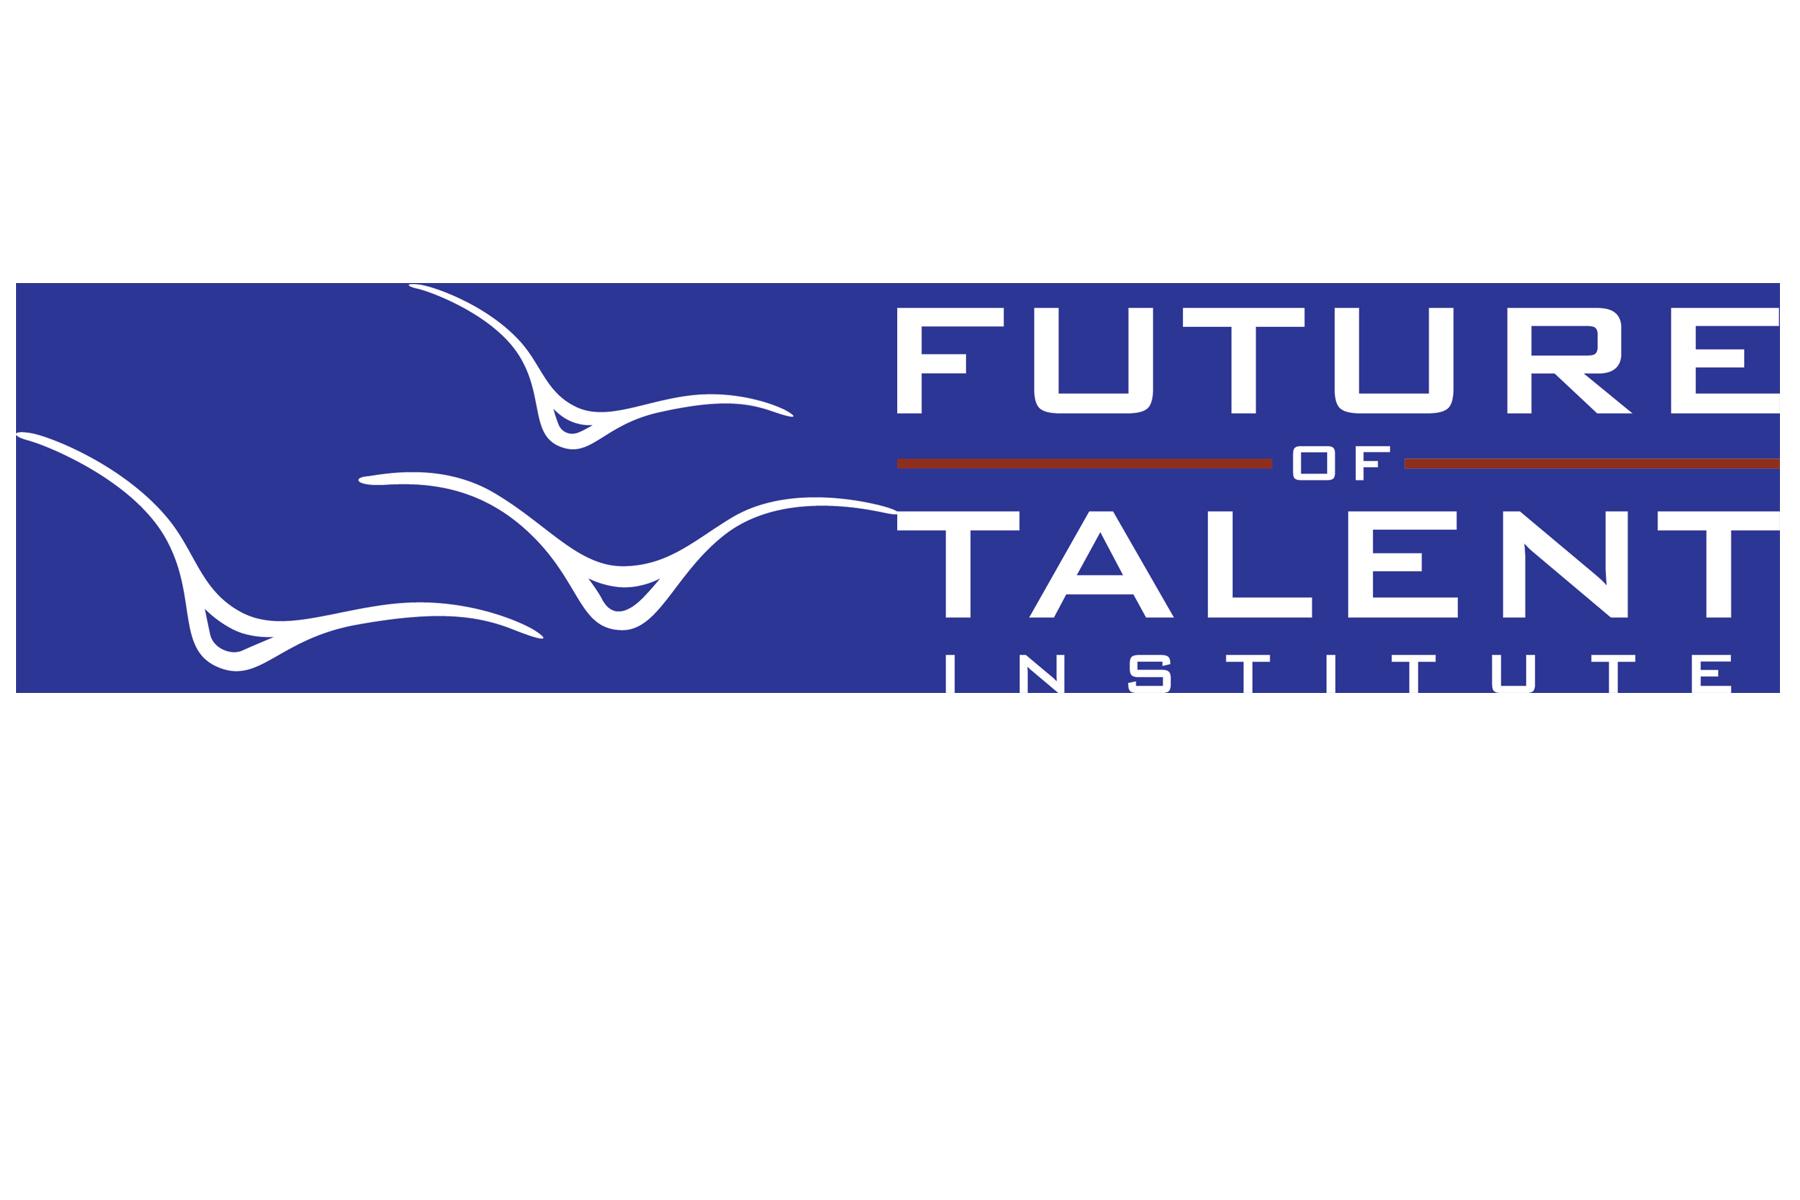 FUTURE-OF-TALENT-INSTITUTE-BLUE-VERSION